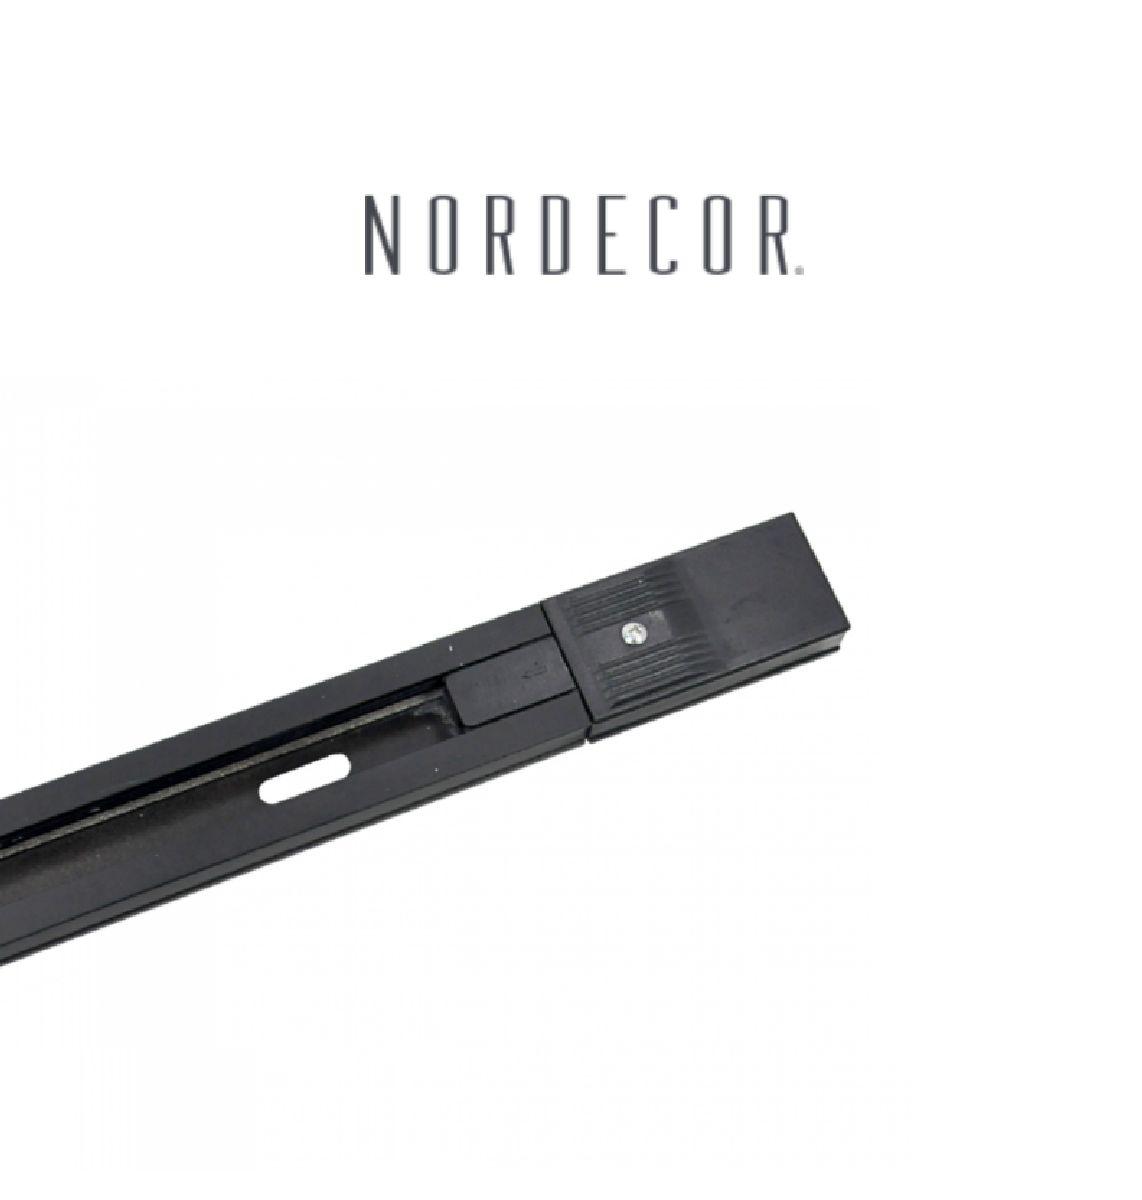 Kit Trilho Eletrificado 2m Preto Nordecor + 4 Spot Redondo MR16 / GU10 Para Sala Quarto Cozinha Quadro